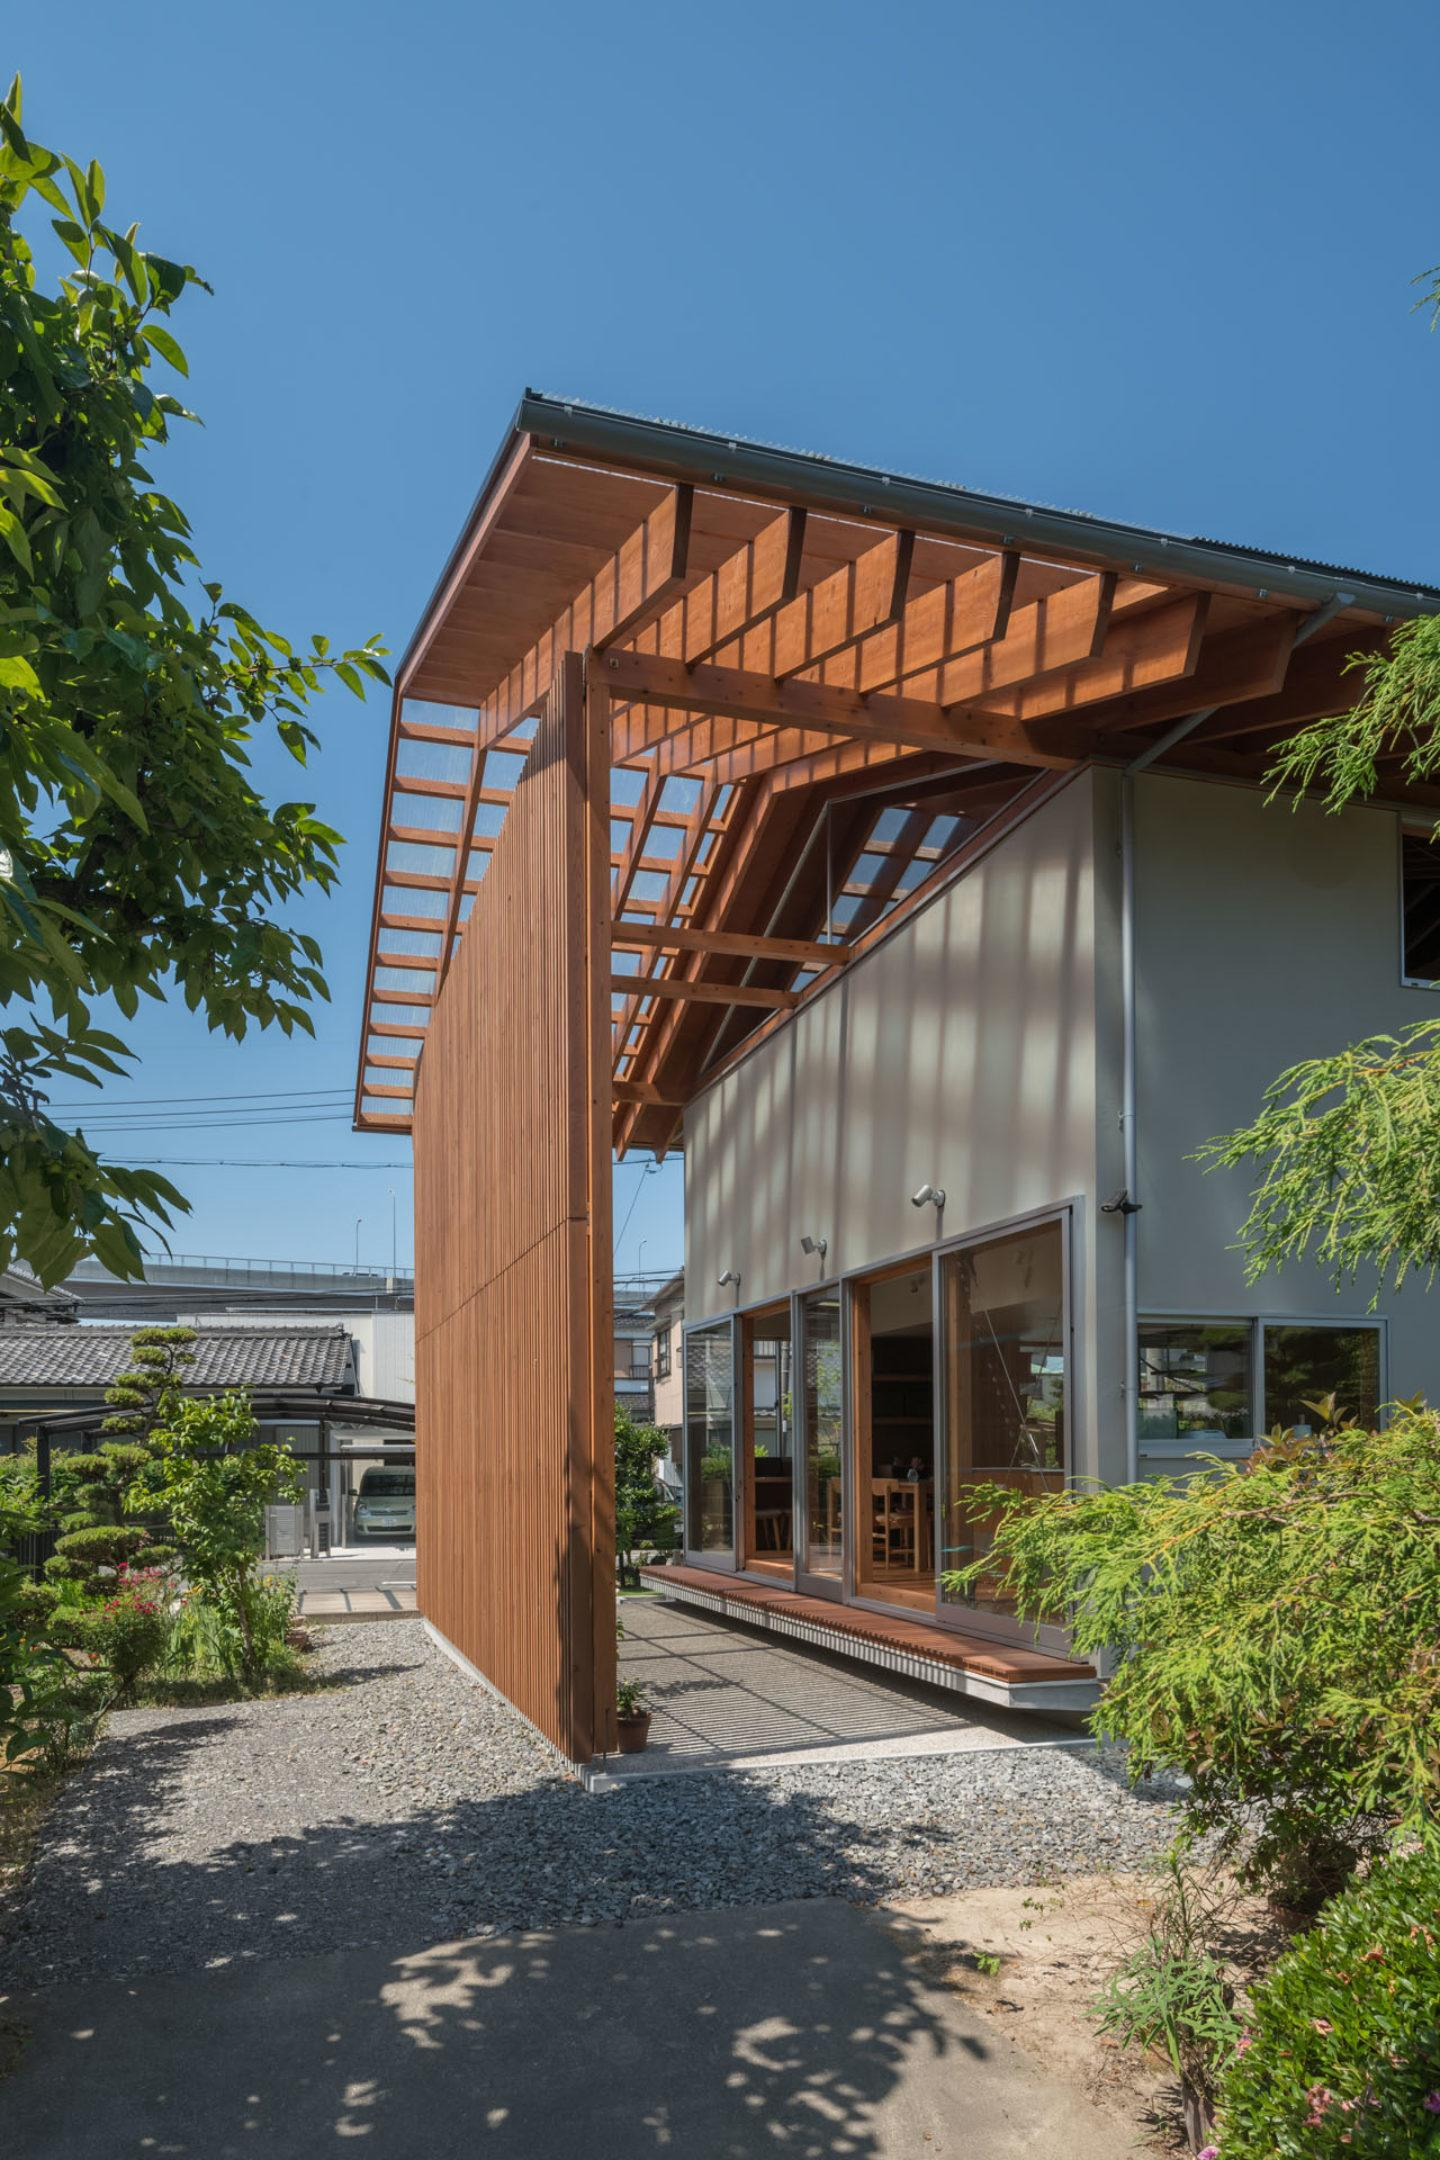 IGNANT-Architecture-Kota-Mizuishi-House-In-Otai-003